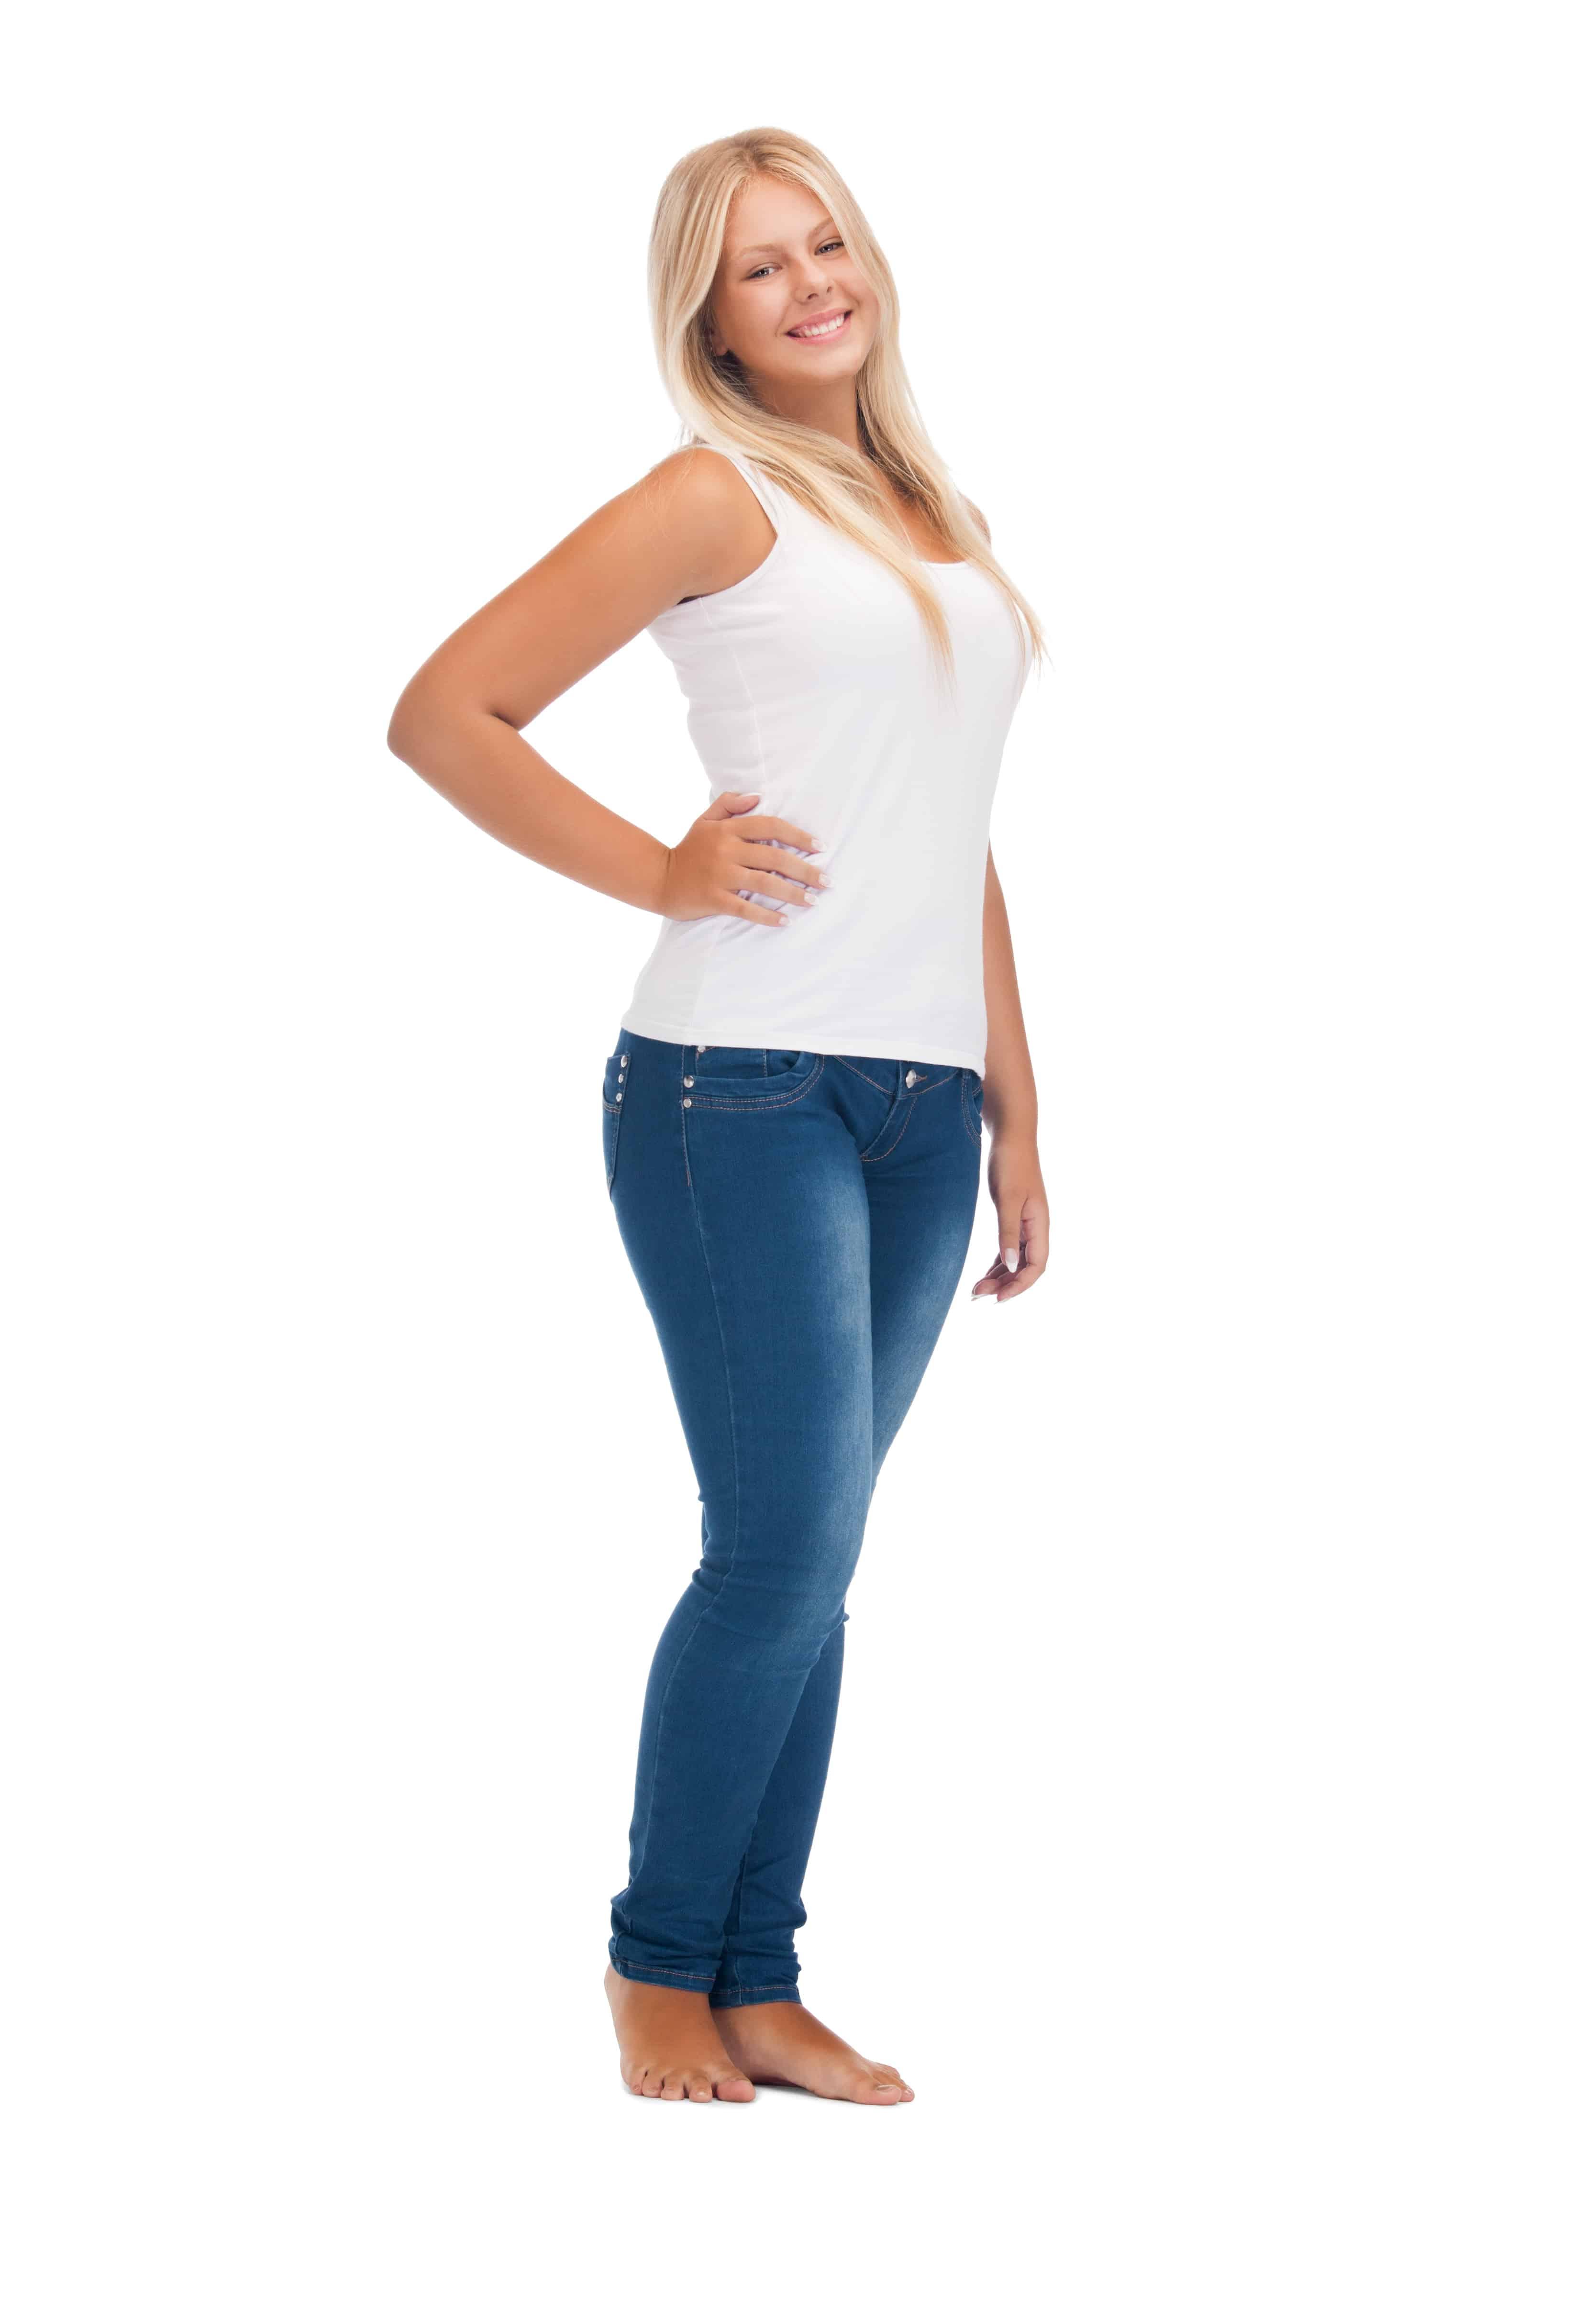 Tummy tuck helps posture